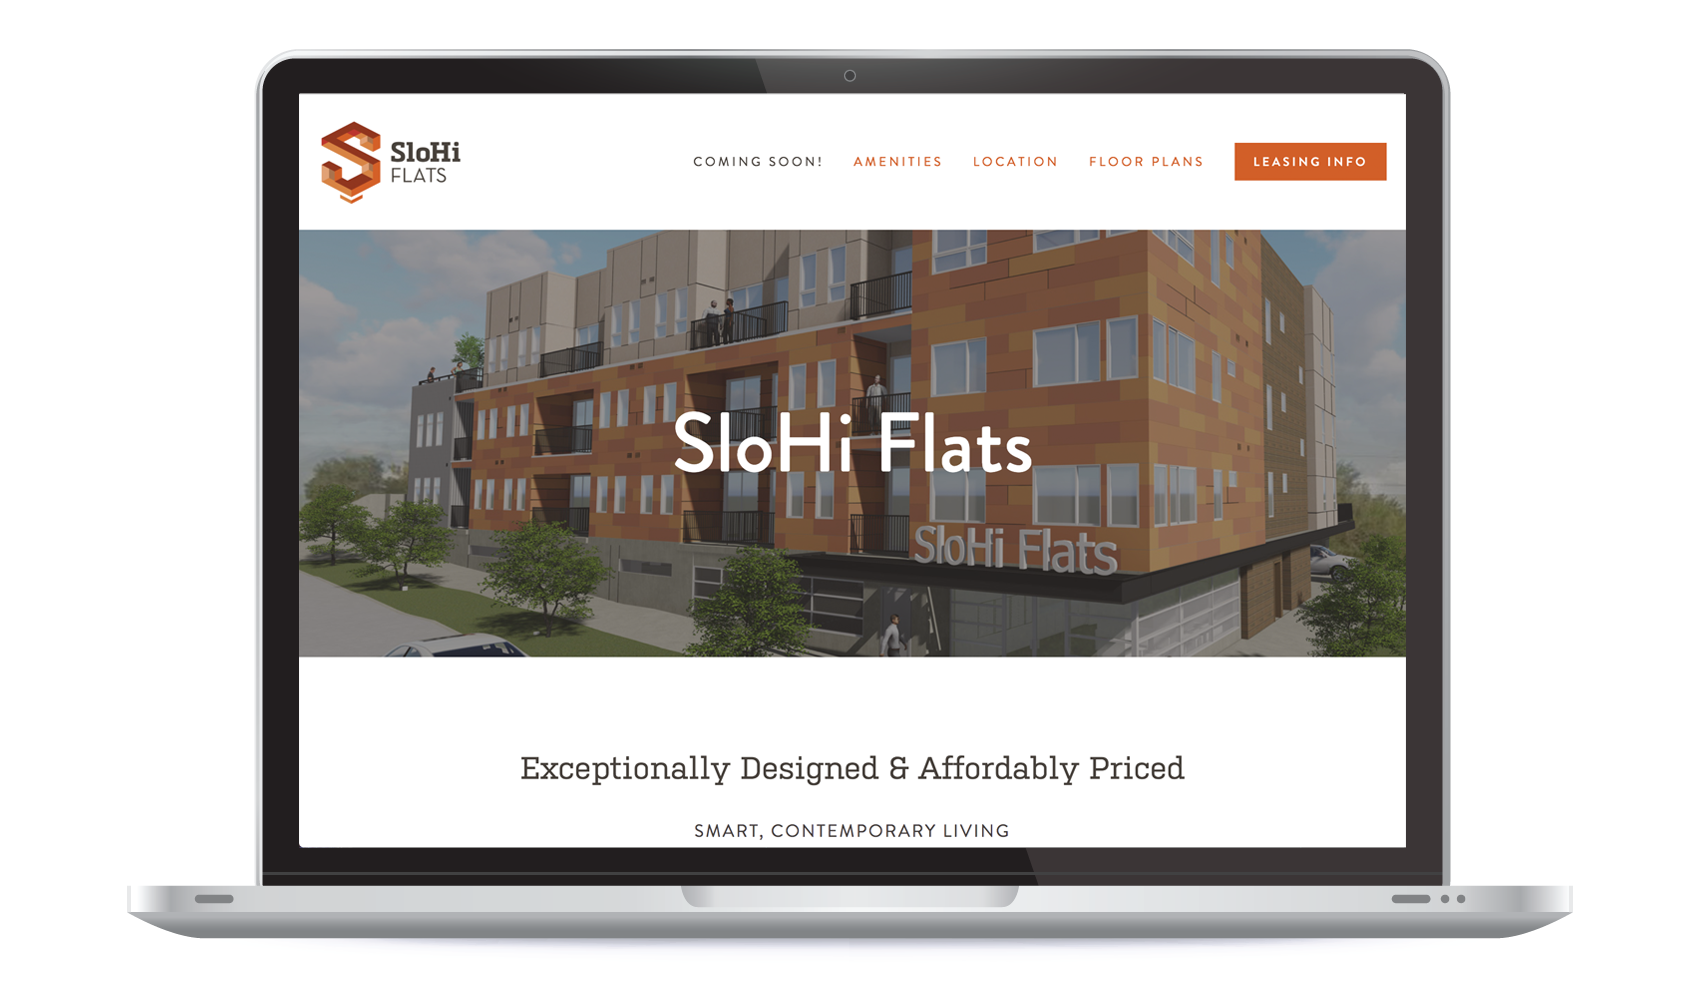 slohi-flats.png